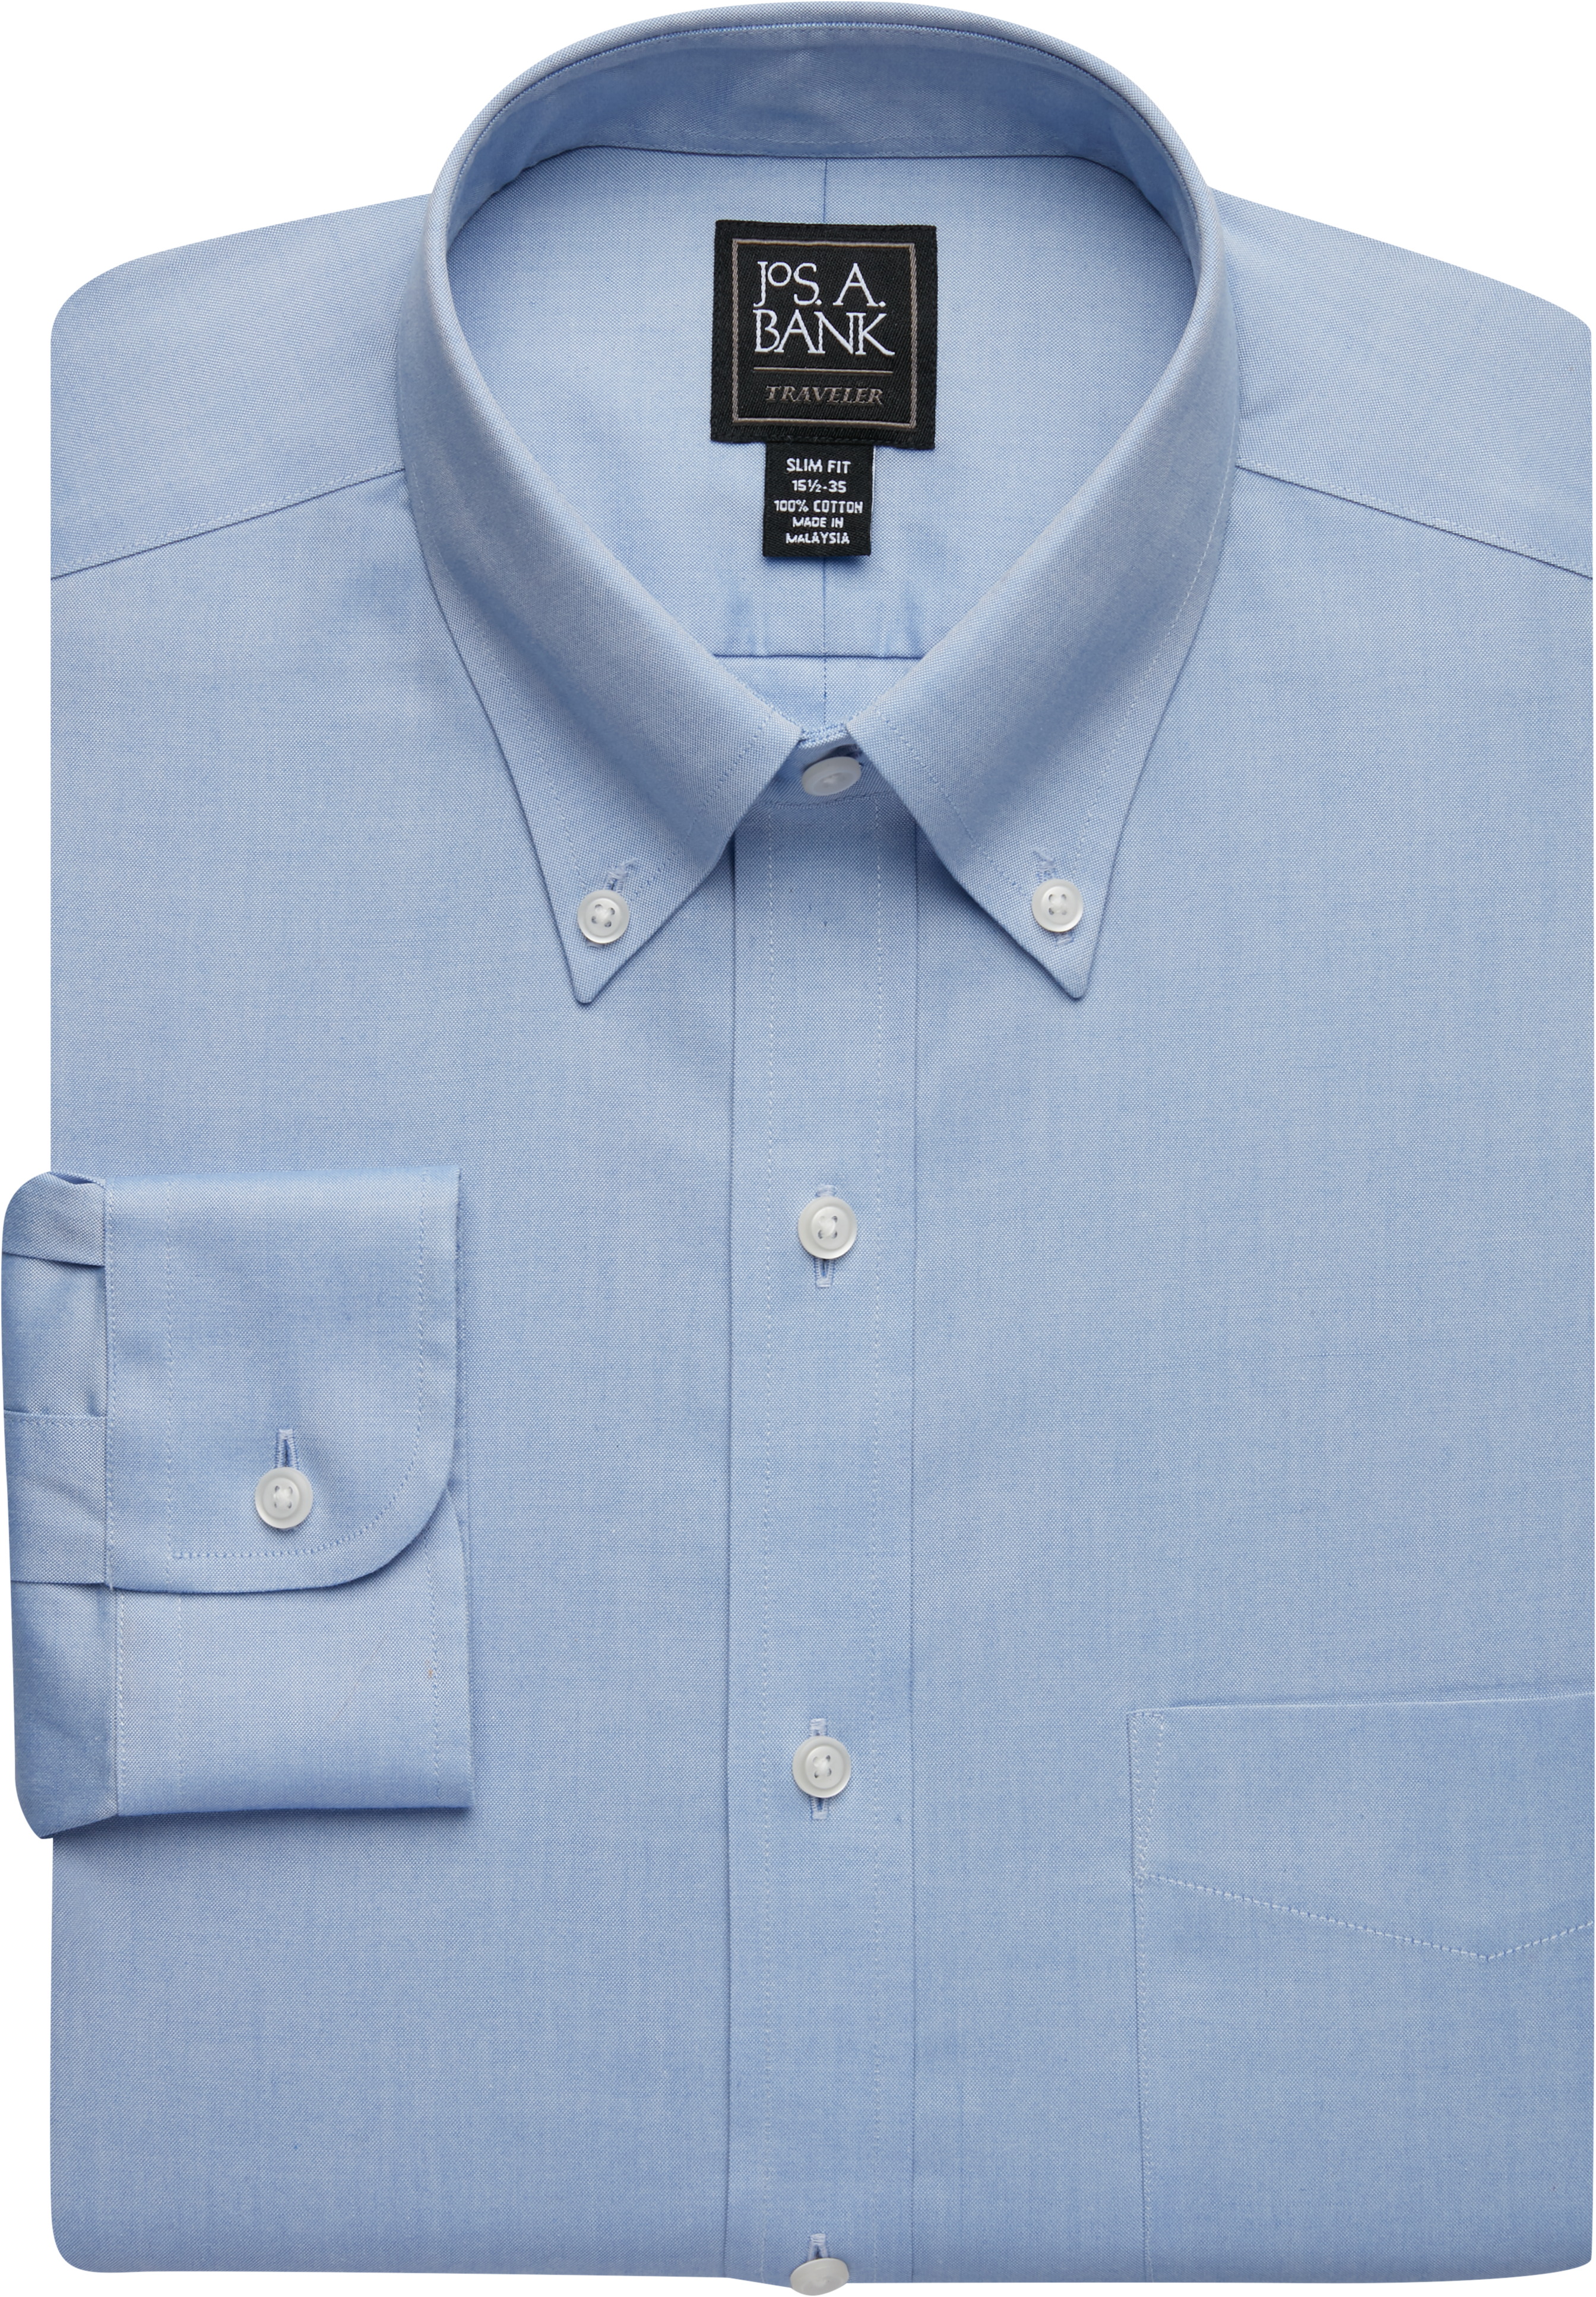 A Jos Bank Traveler Sportshirt Button Collar Fine 80s Two-ply 100/% Cotton